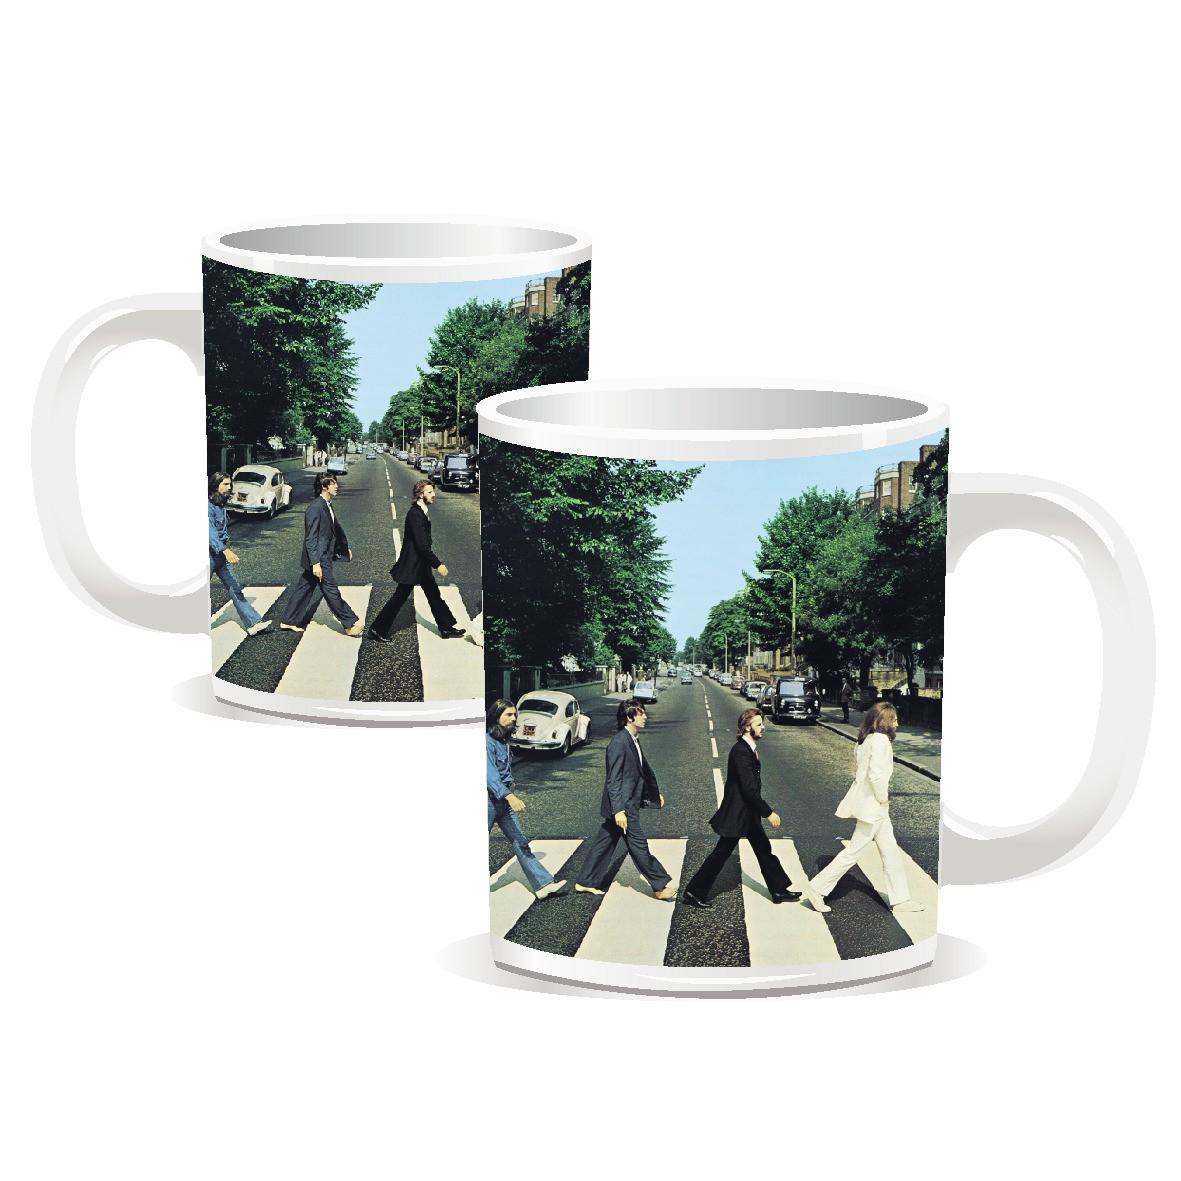 NEW BEATLES ABBEY ROAD BOXED MINI ESPRESSO MUG LENNON RINGO COFFEE CUP OFFICIAL